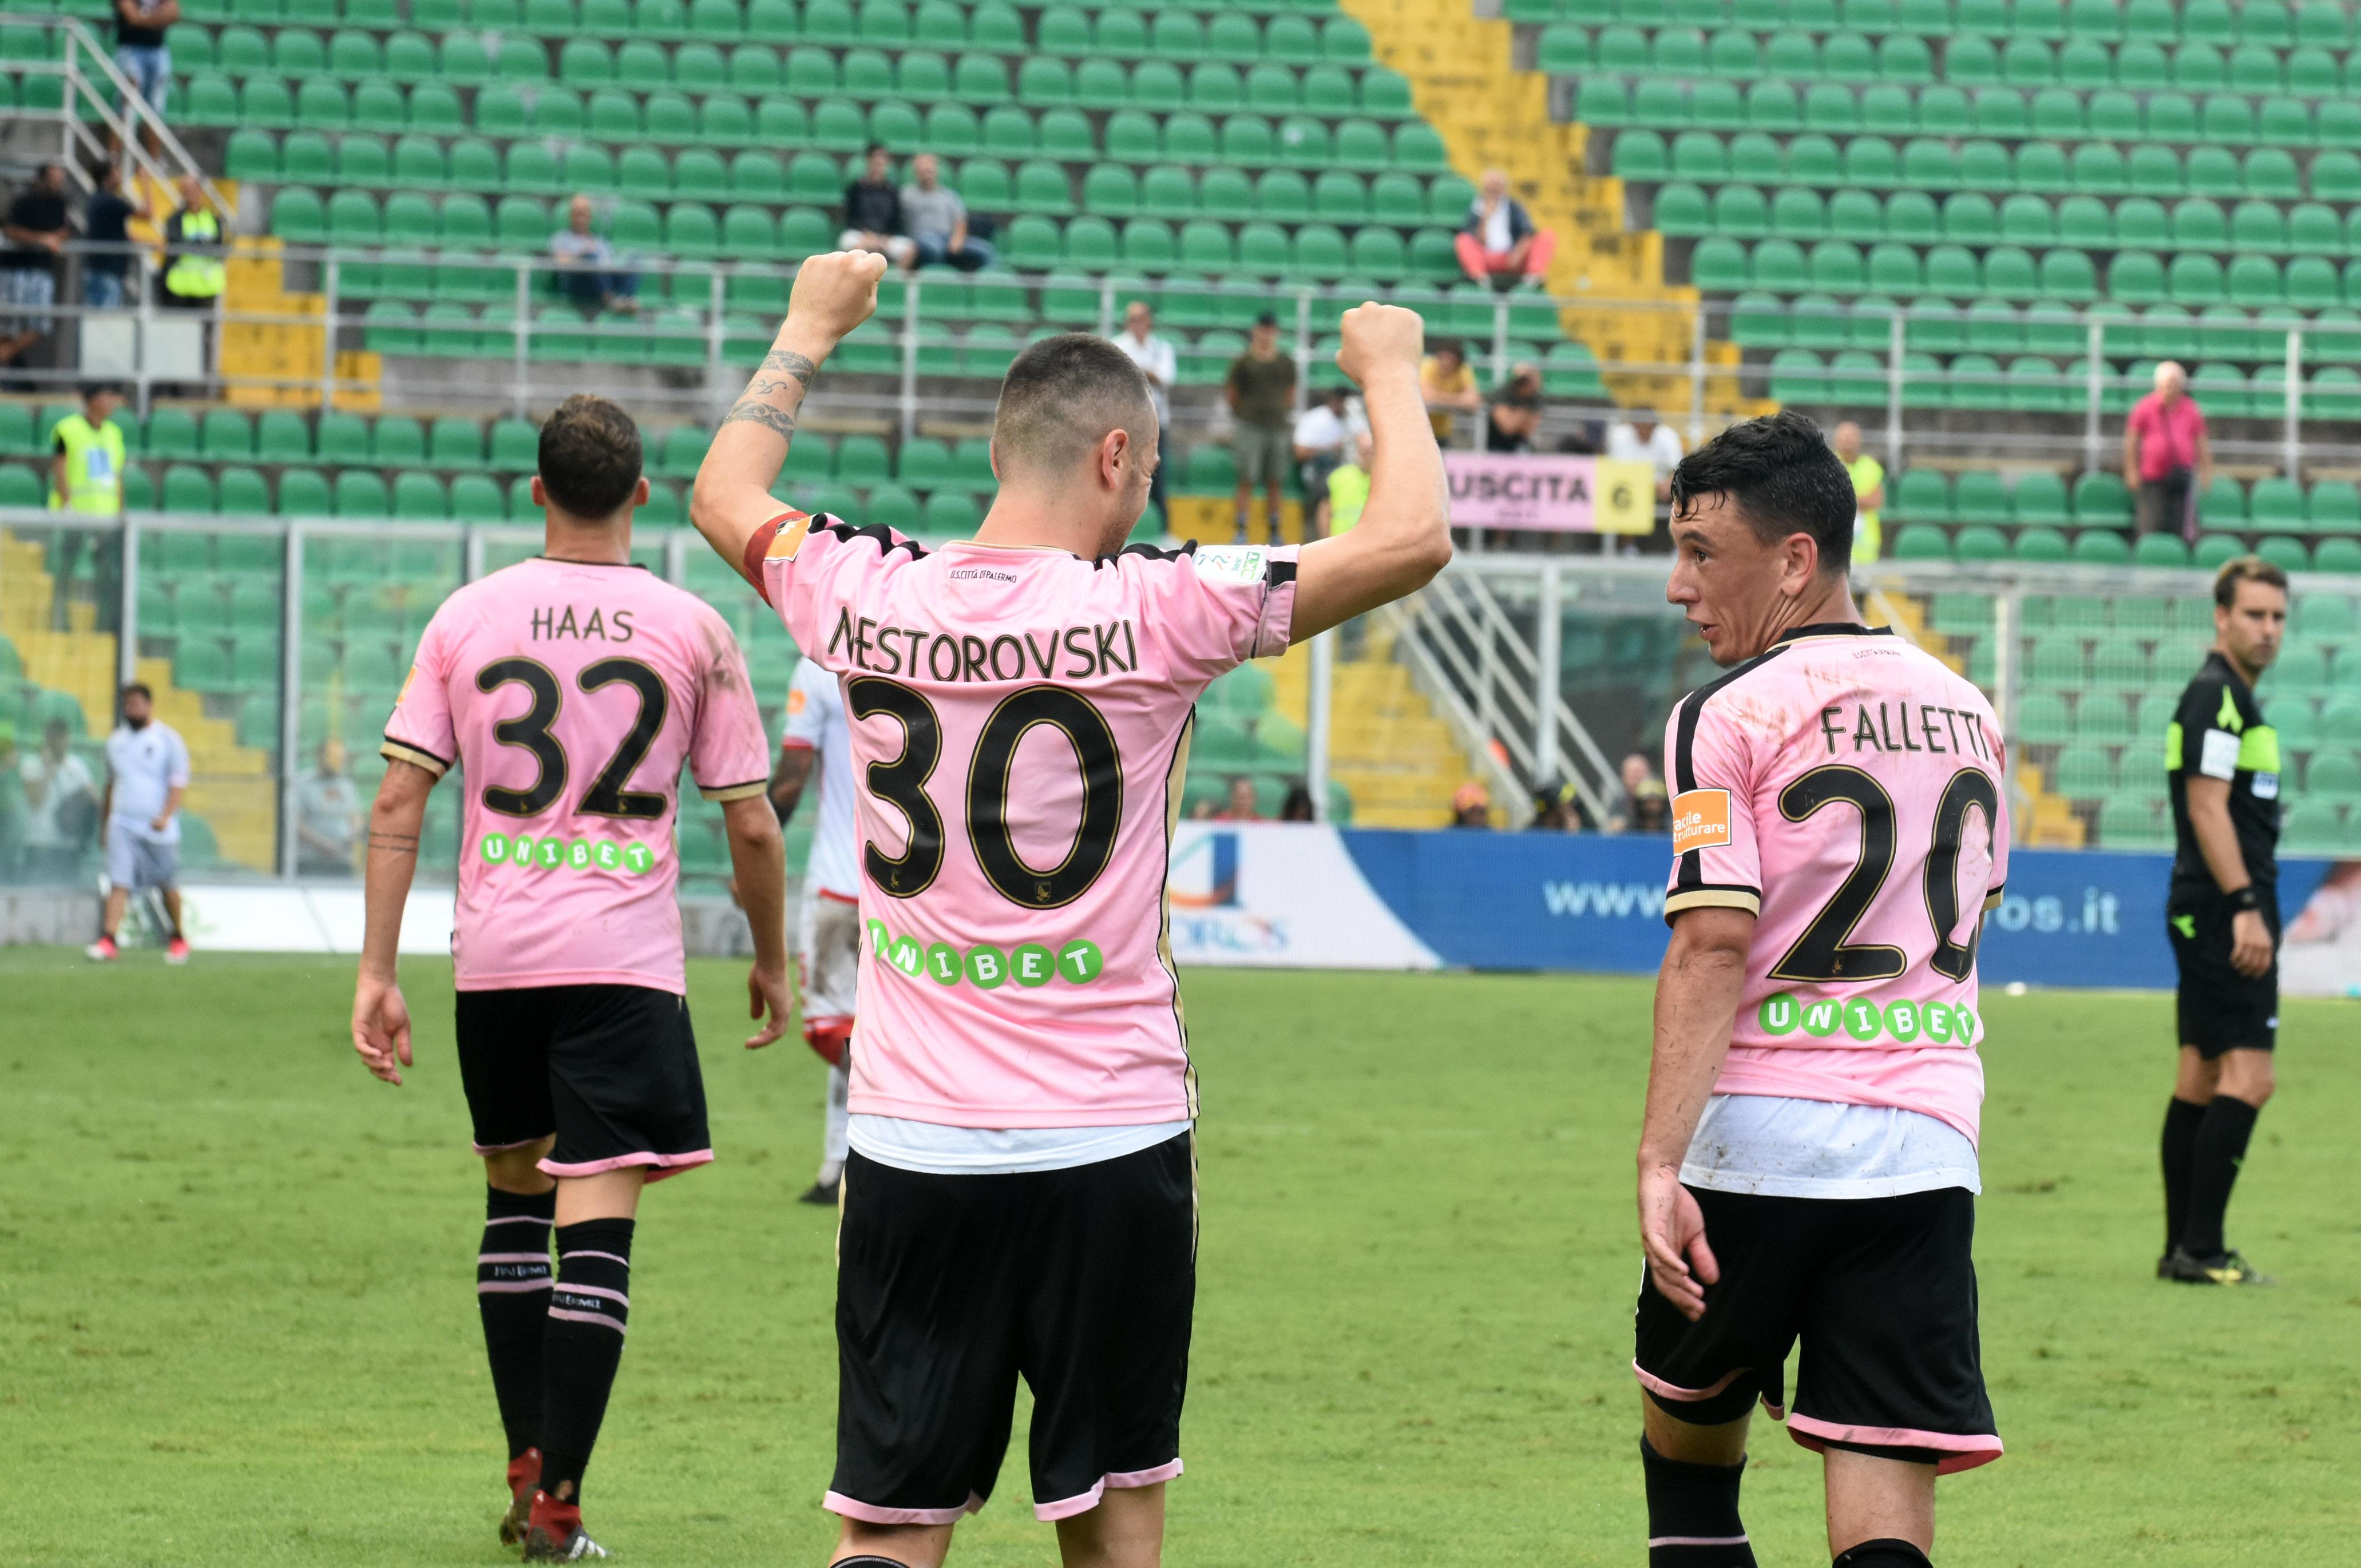 Palermo Perugia Nestorovski